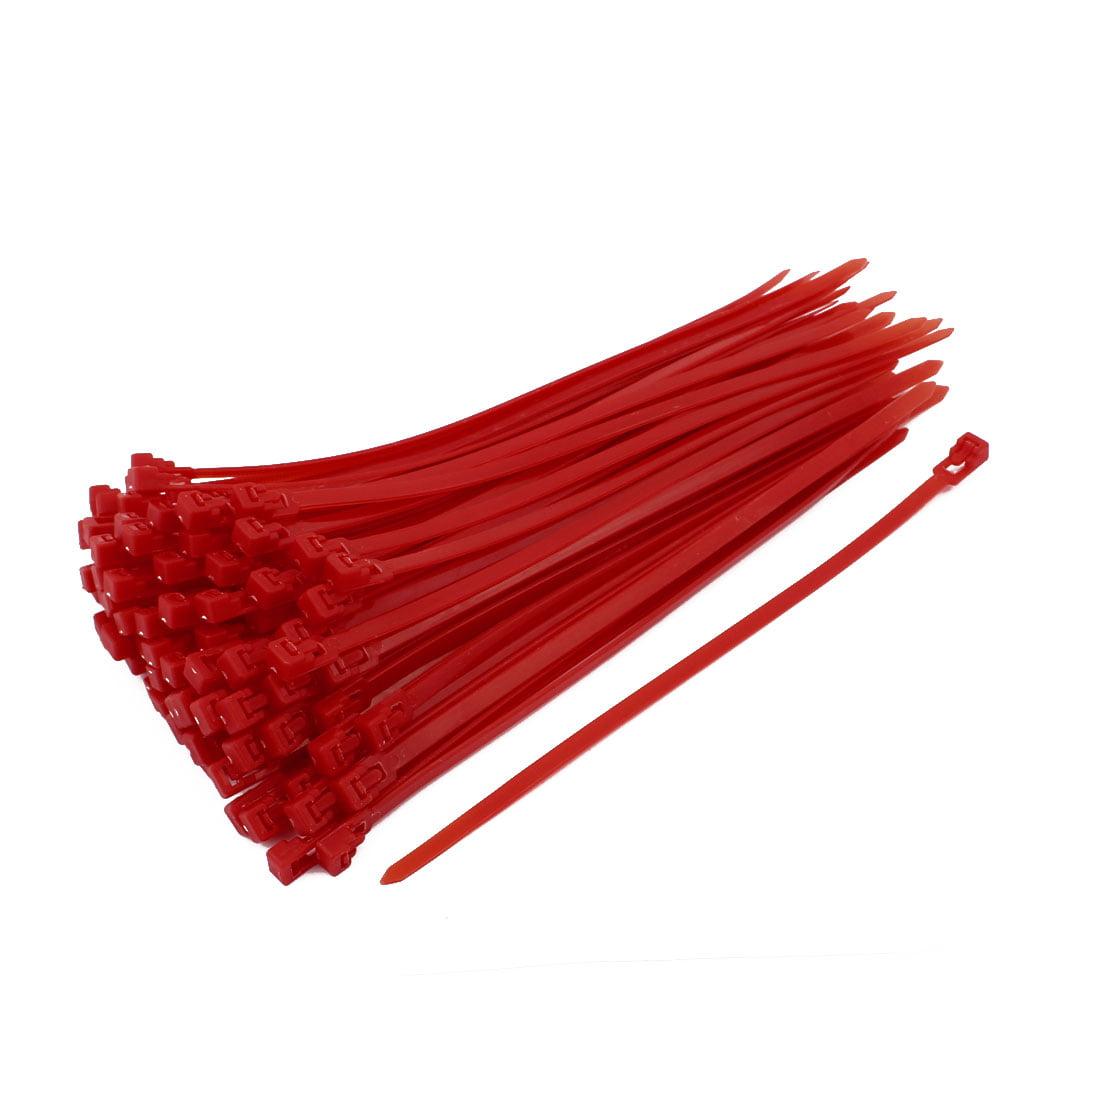 100Pcs 5x200mm Nylon Wire Tie Fastener Strap Adjustable Reusable Hook Loop